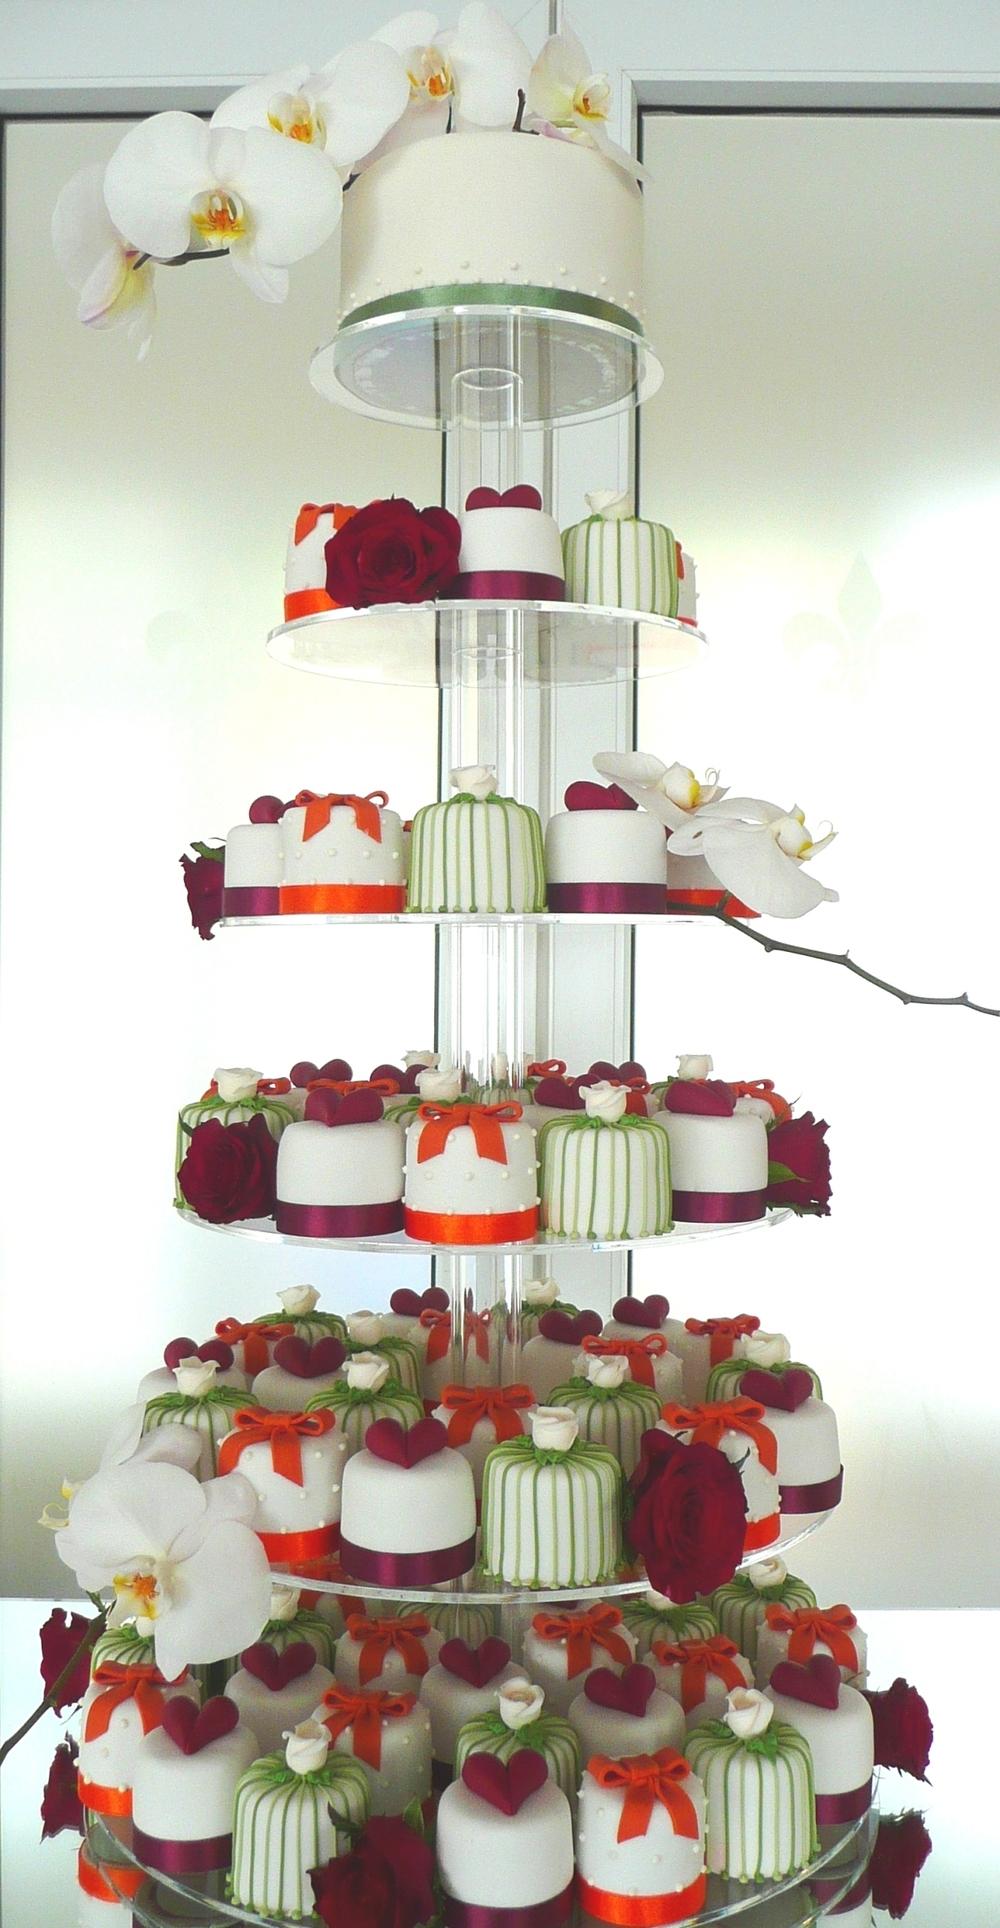 corne cake 009.jpg